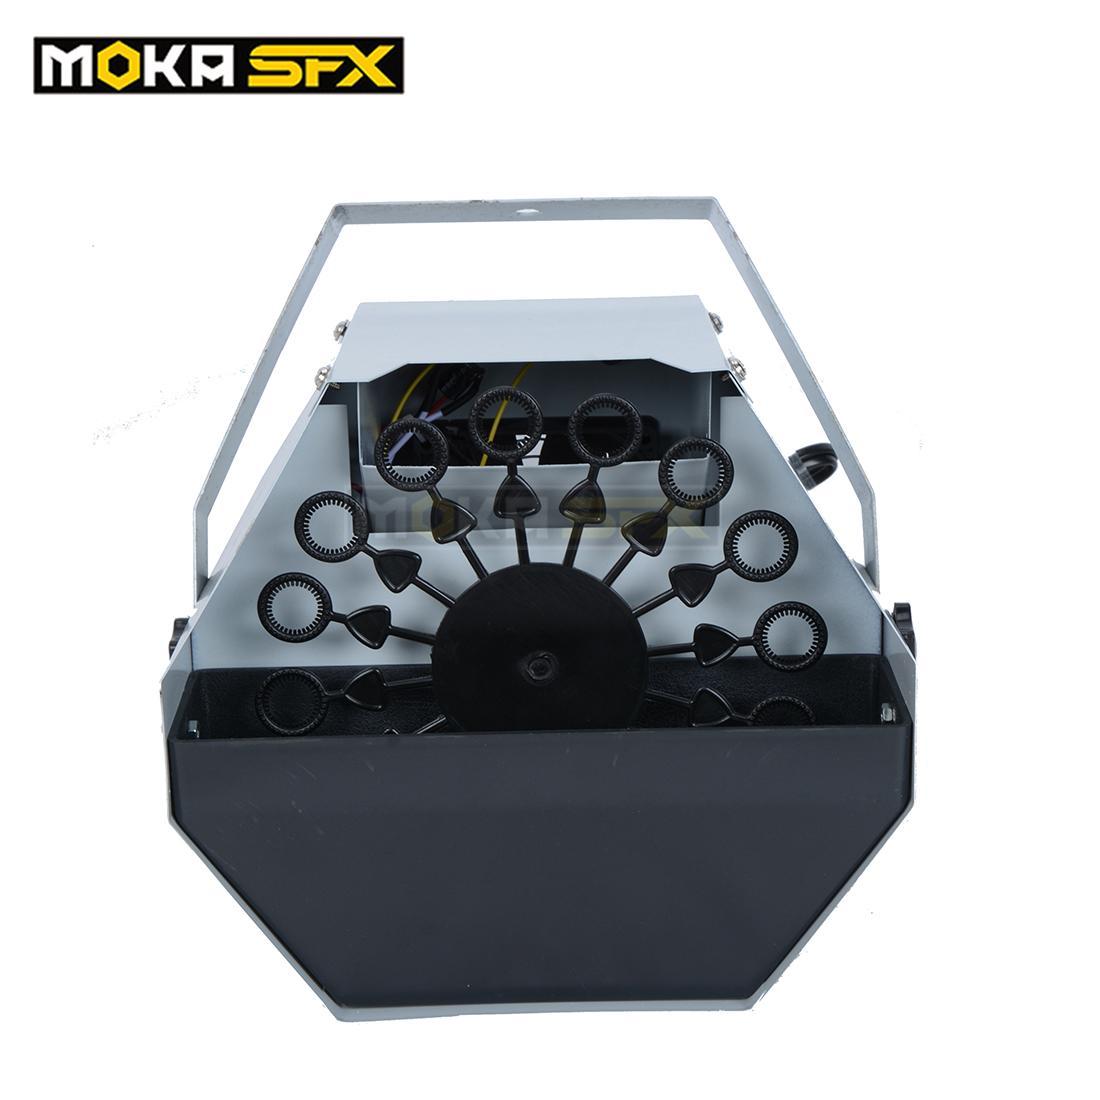 2pcs/lot Moka MK-B03 60W Mini Bubble Maker Machine with Remote Control Special Stage Party Effect